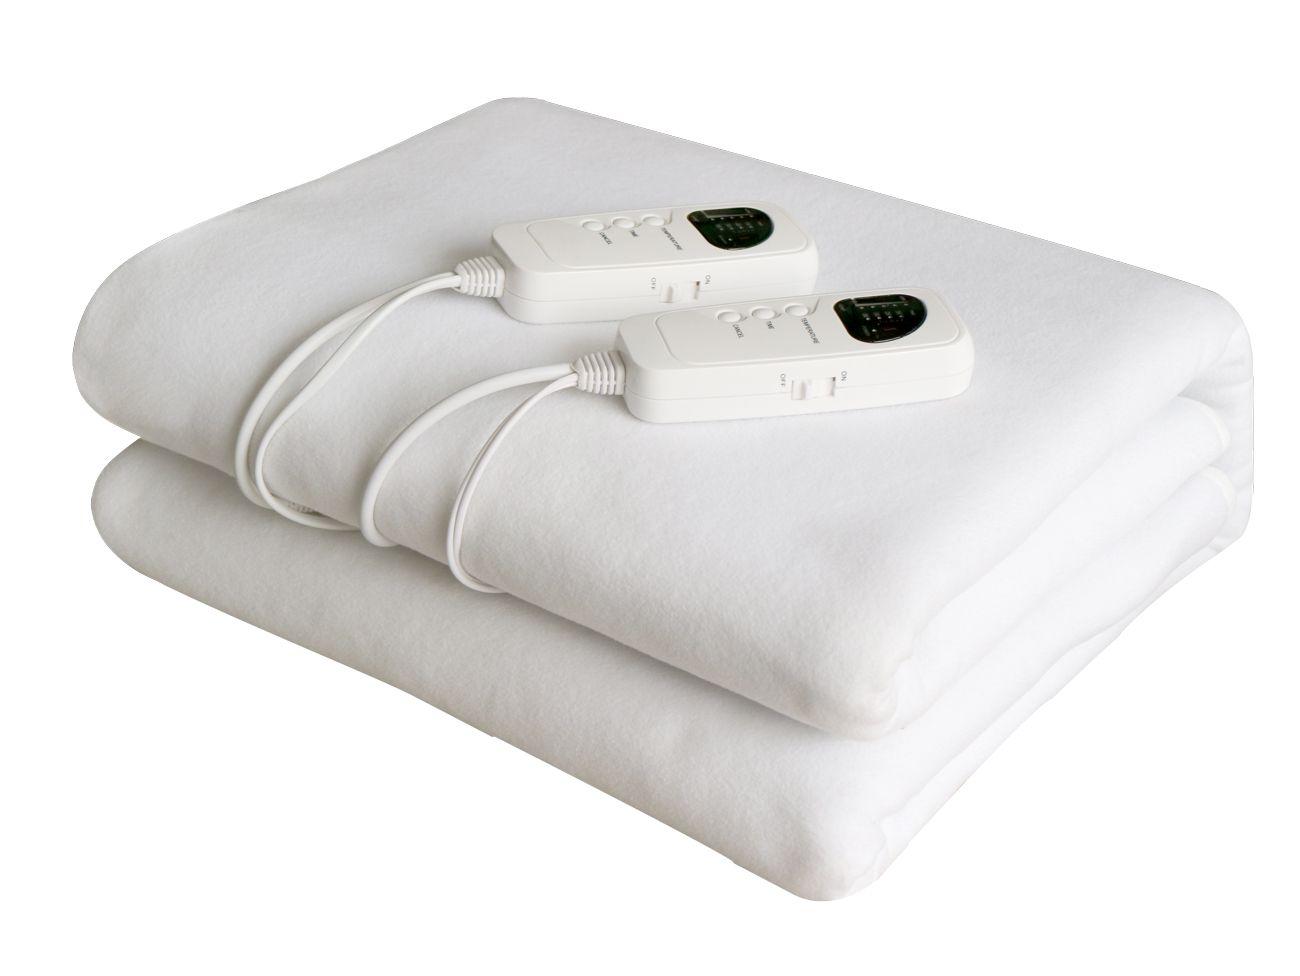 Lençol Térmico Cobertor Elétrico Kenko Solteiro 80x190cm Luxo Multi Temperaturas   - Kenko Premium Colchões